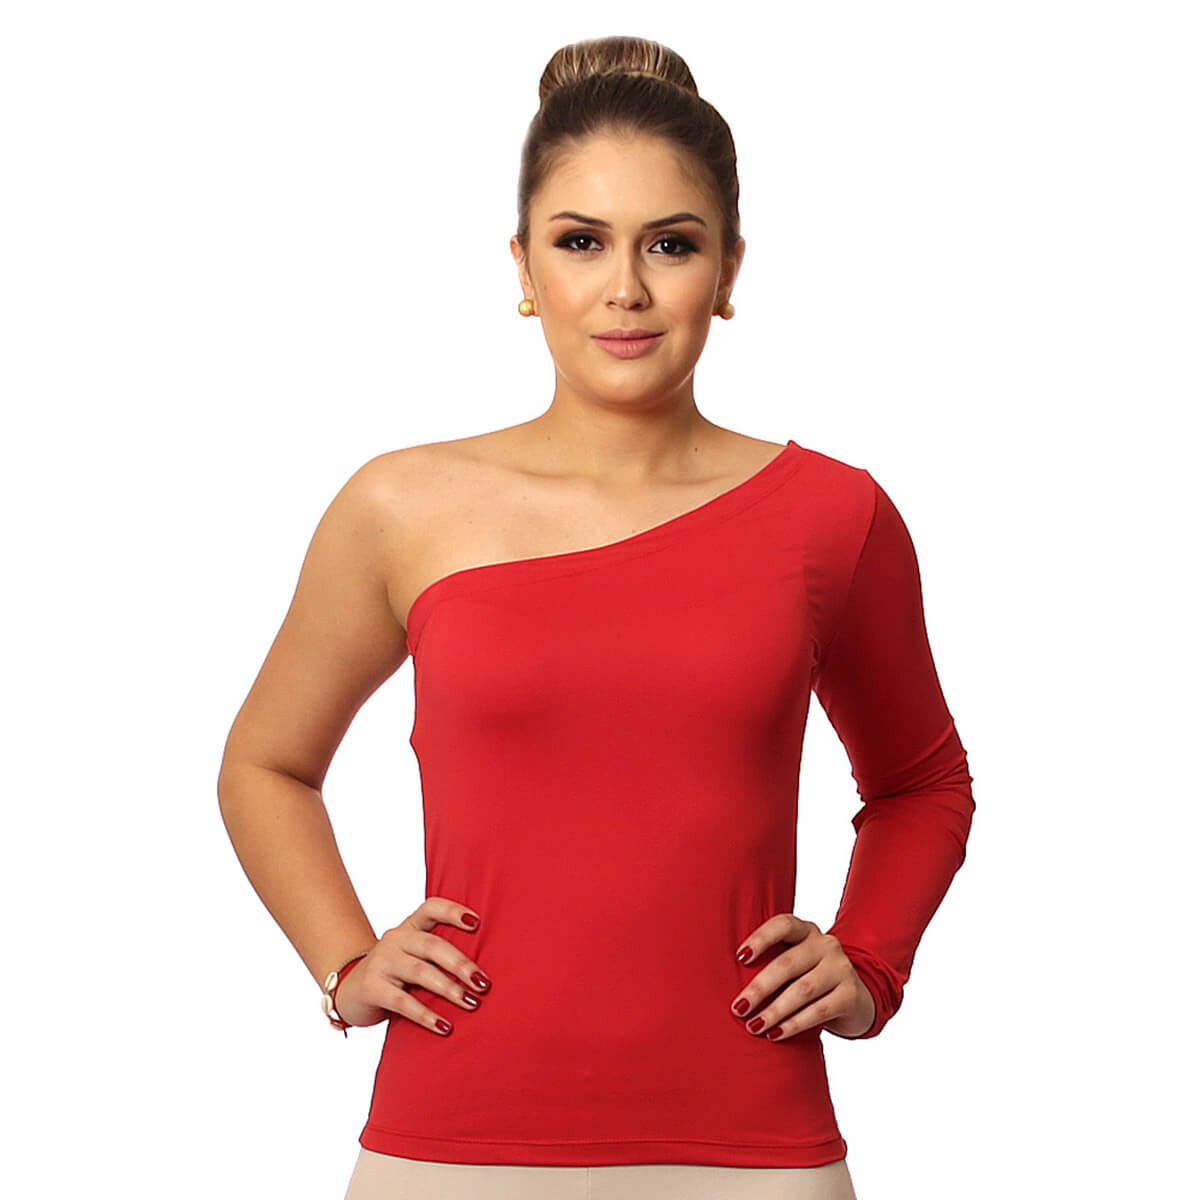 Blusa Feminina de Ombro Só Manga Longa Vermelha